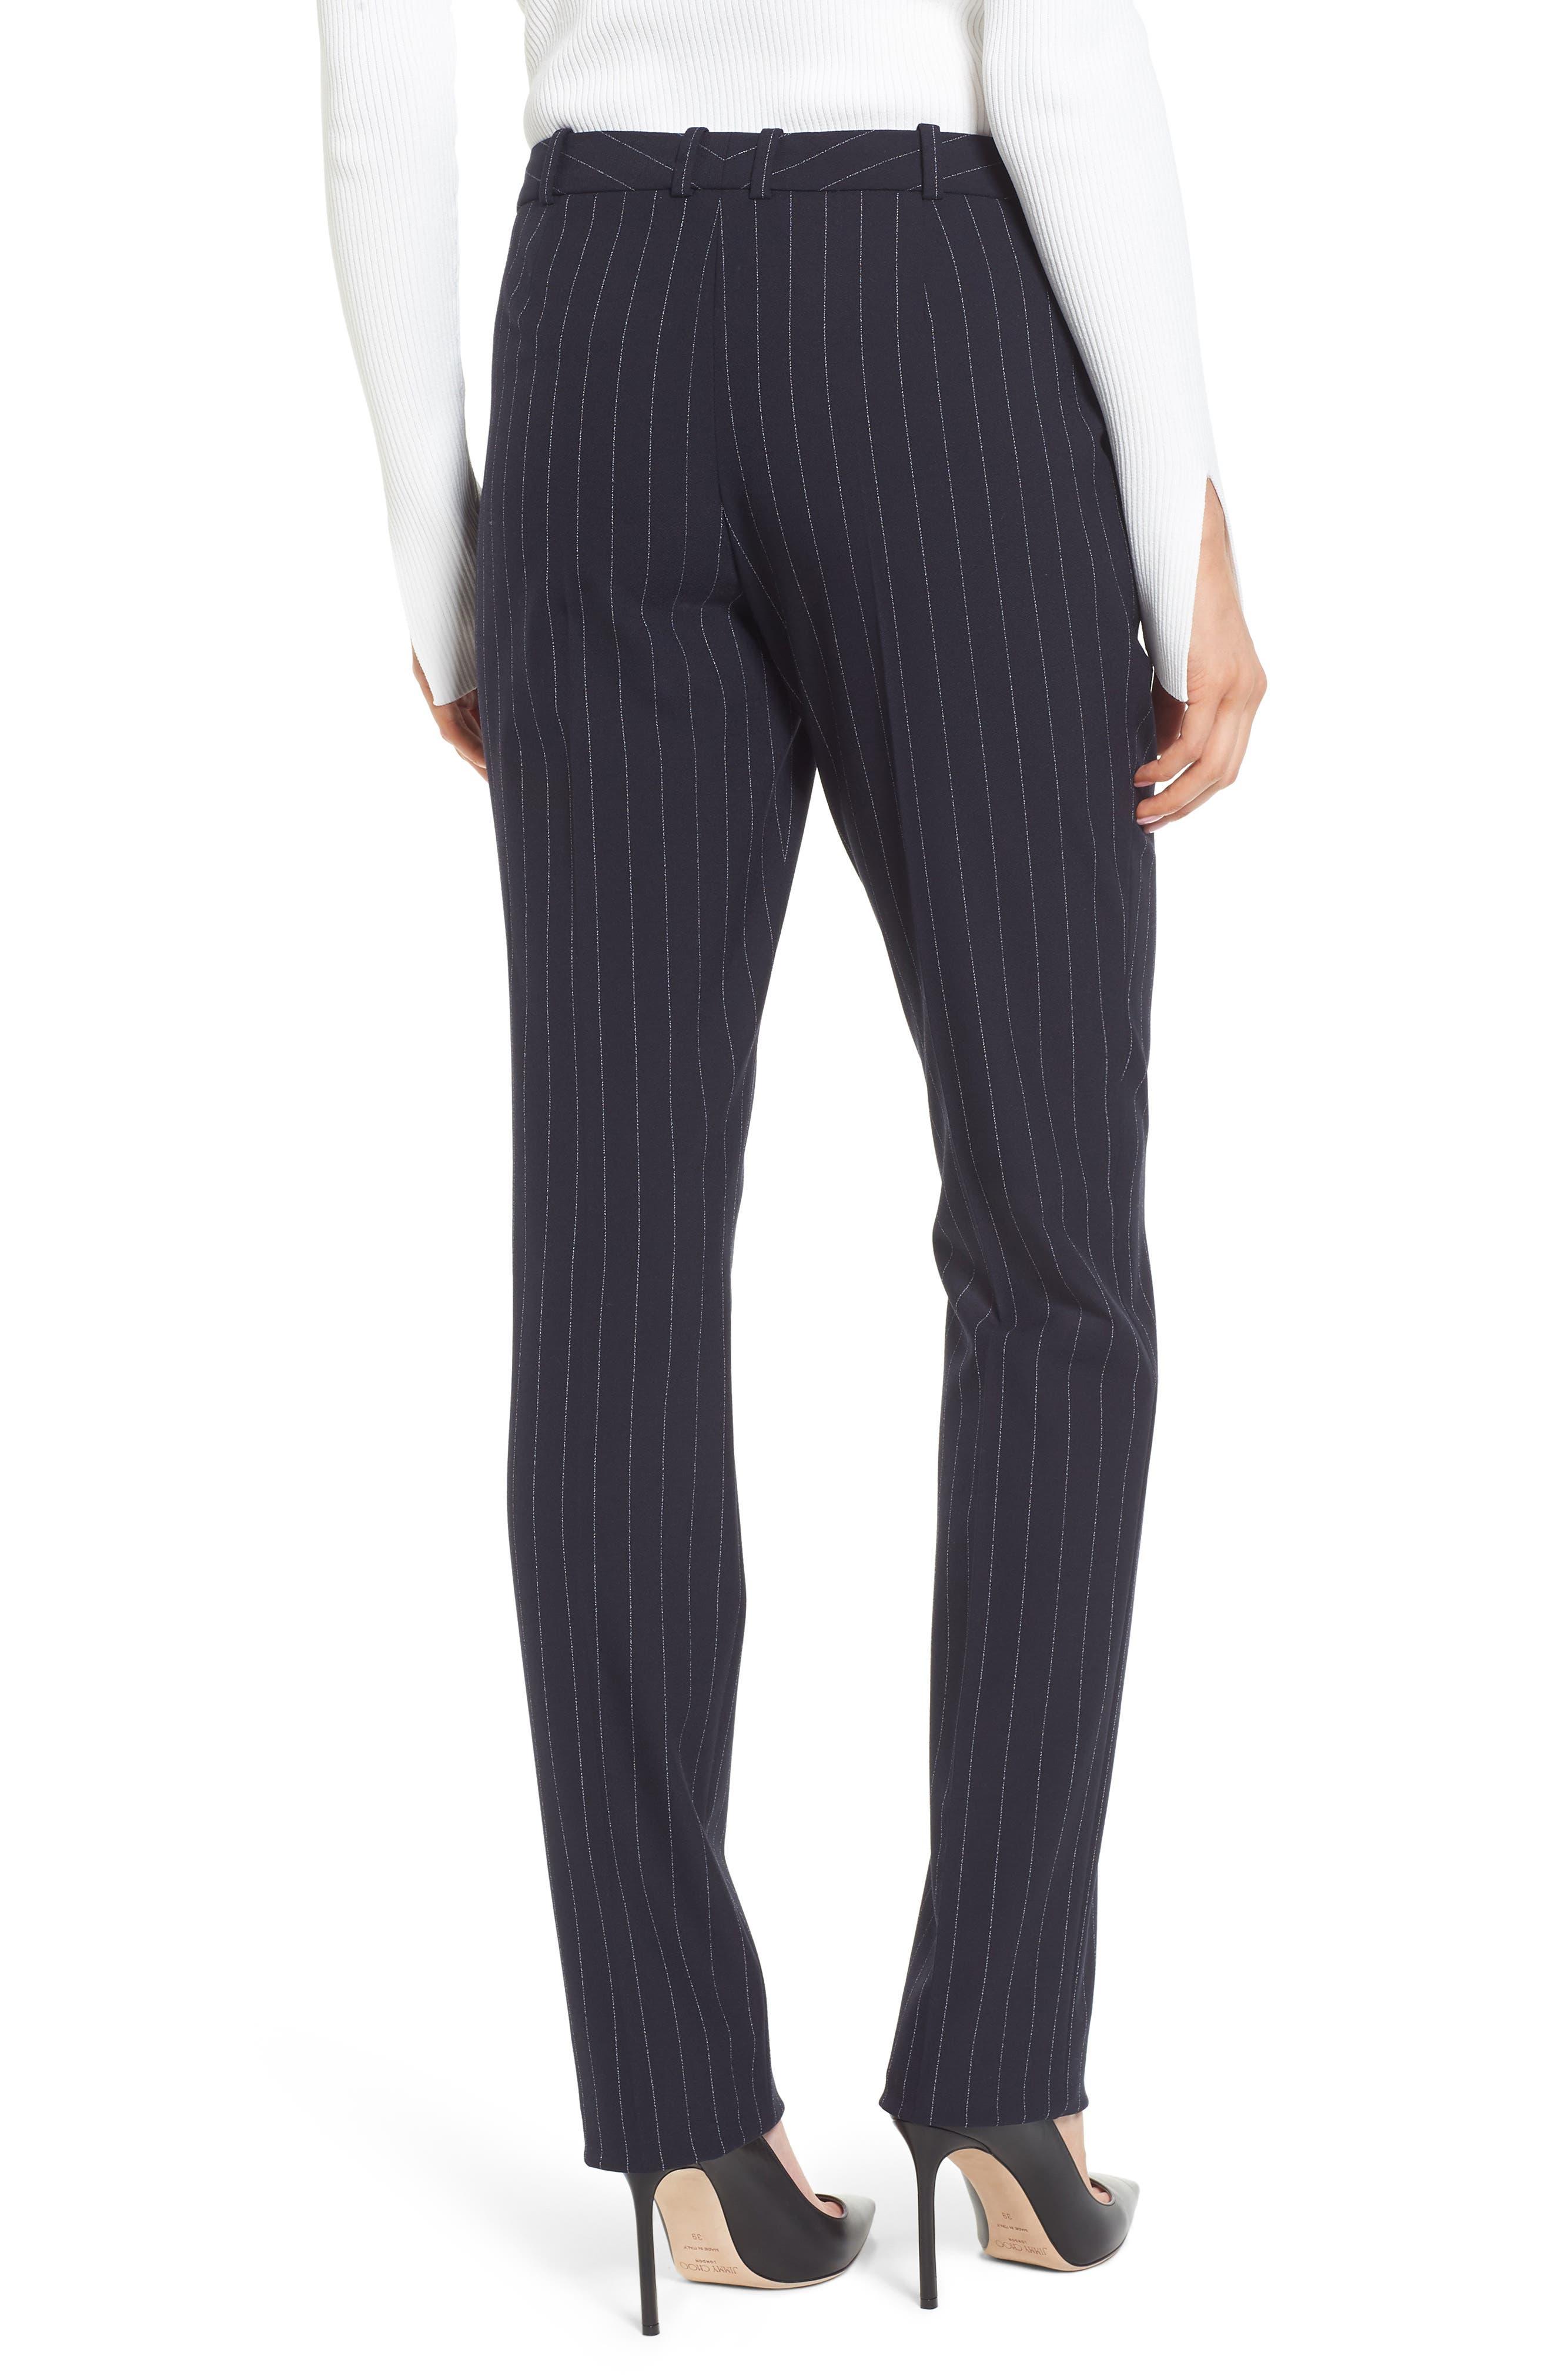 Titana Pinstripe Suit Trousers,                             Alternate thumbnail 3, color,                             Navy Fantasy